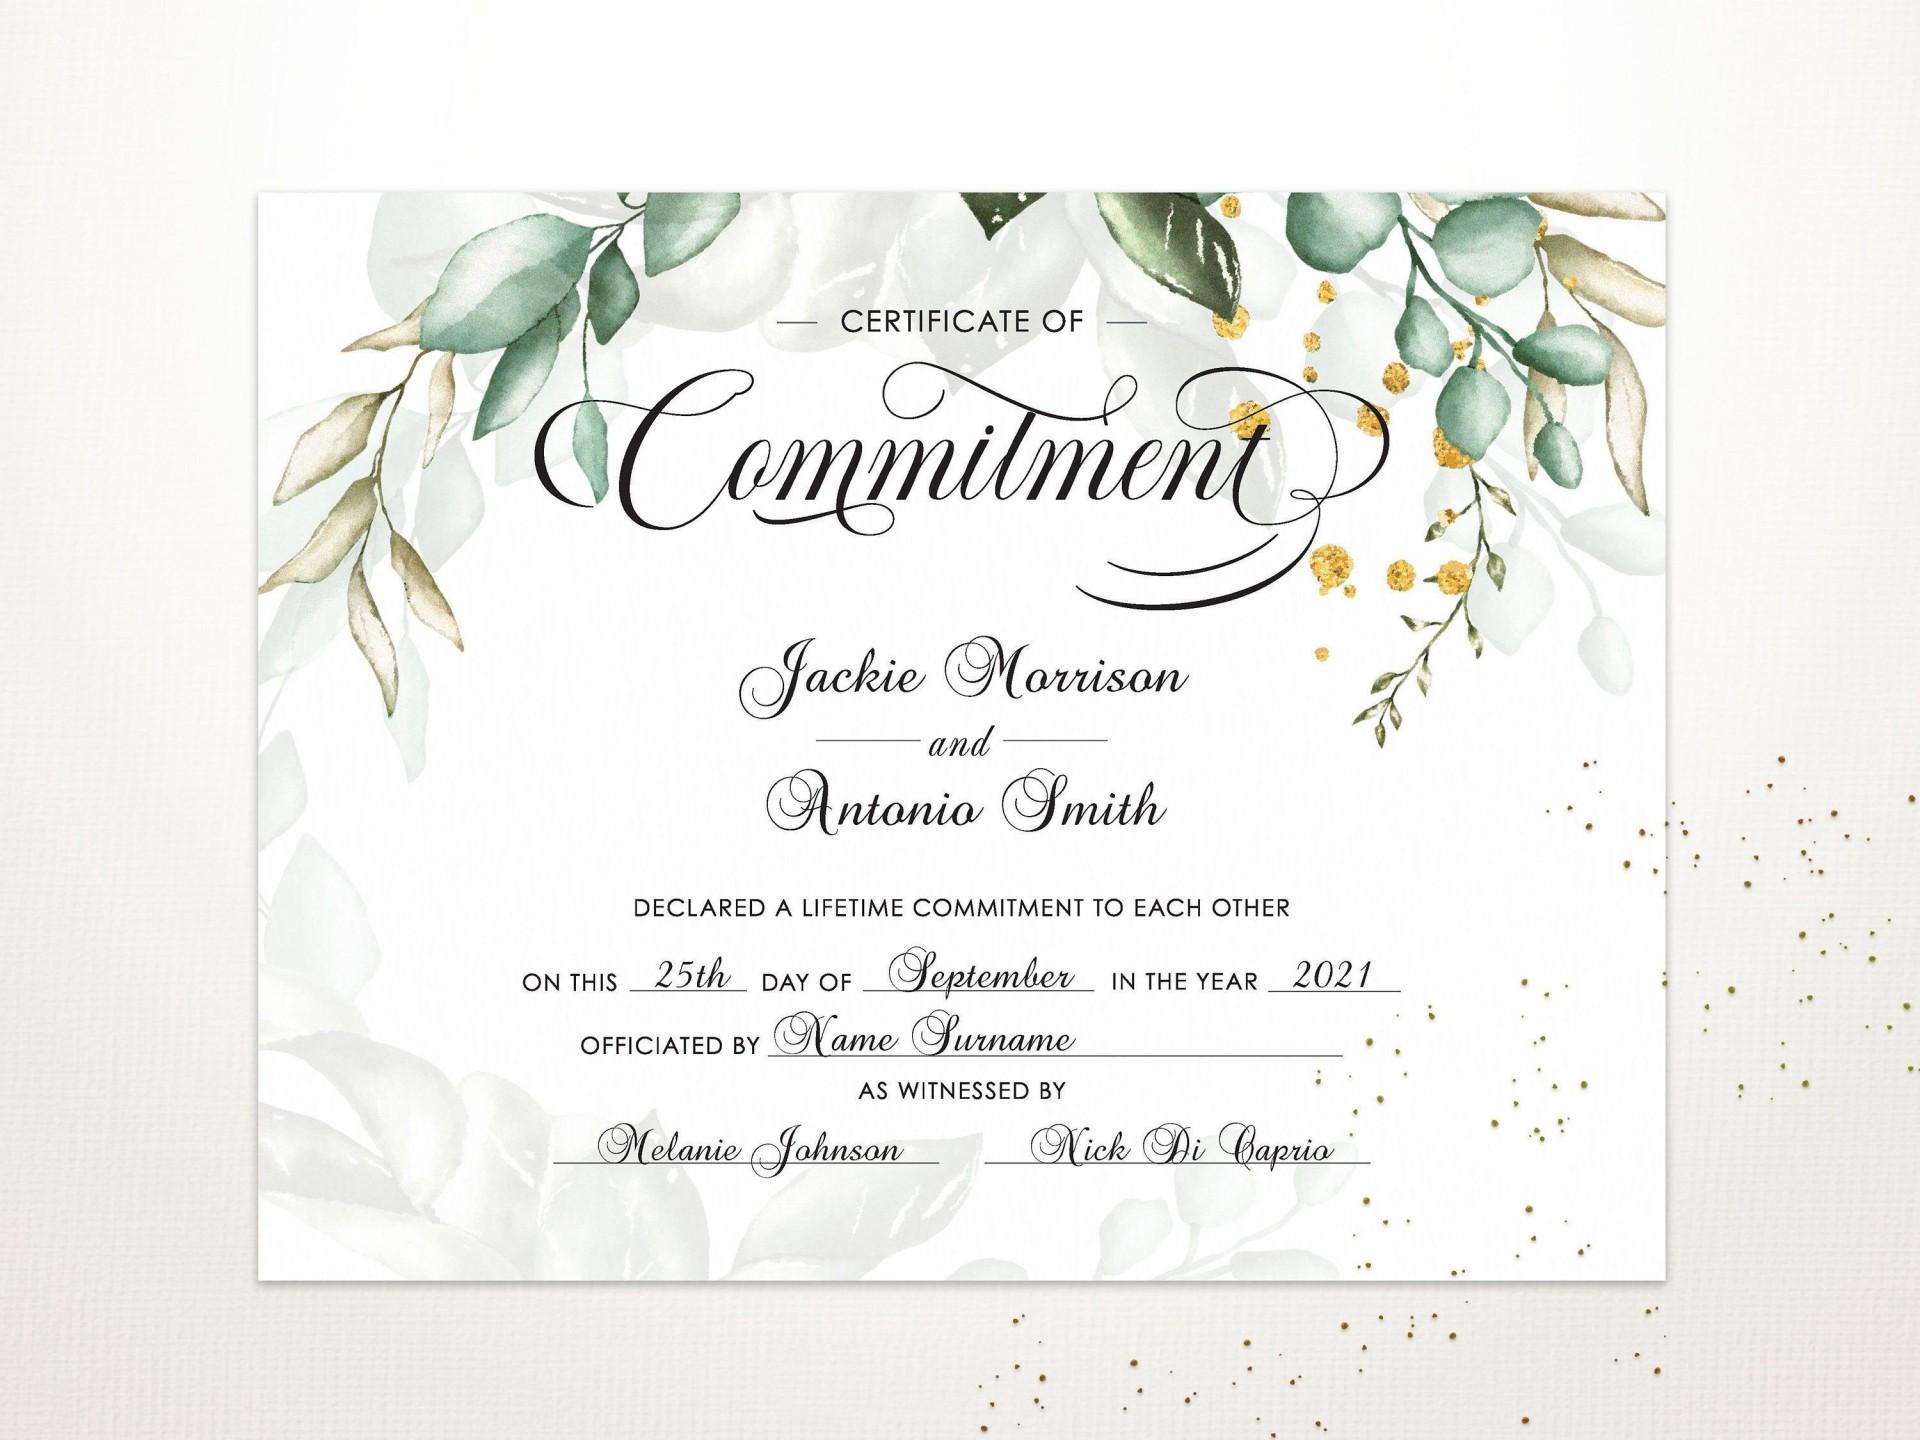 001 Wonderful Certificate Of Marriage Template Idea  Word Australia1920